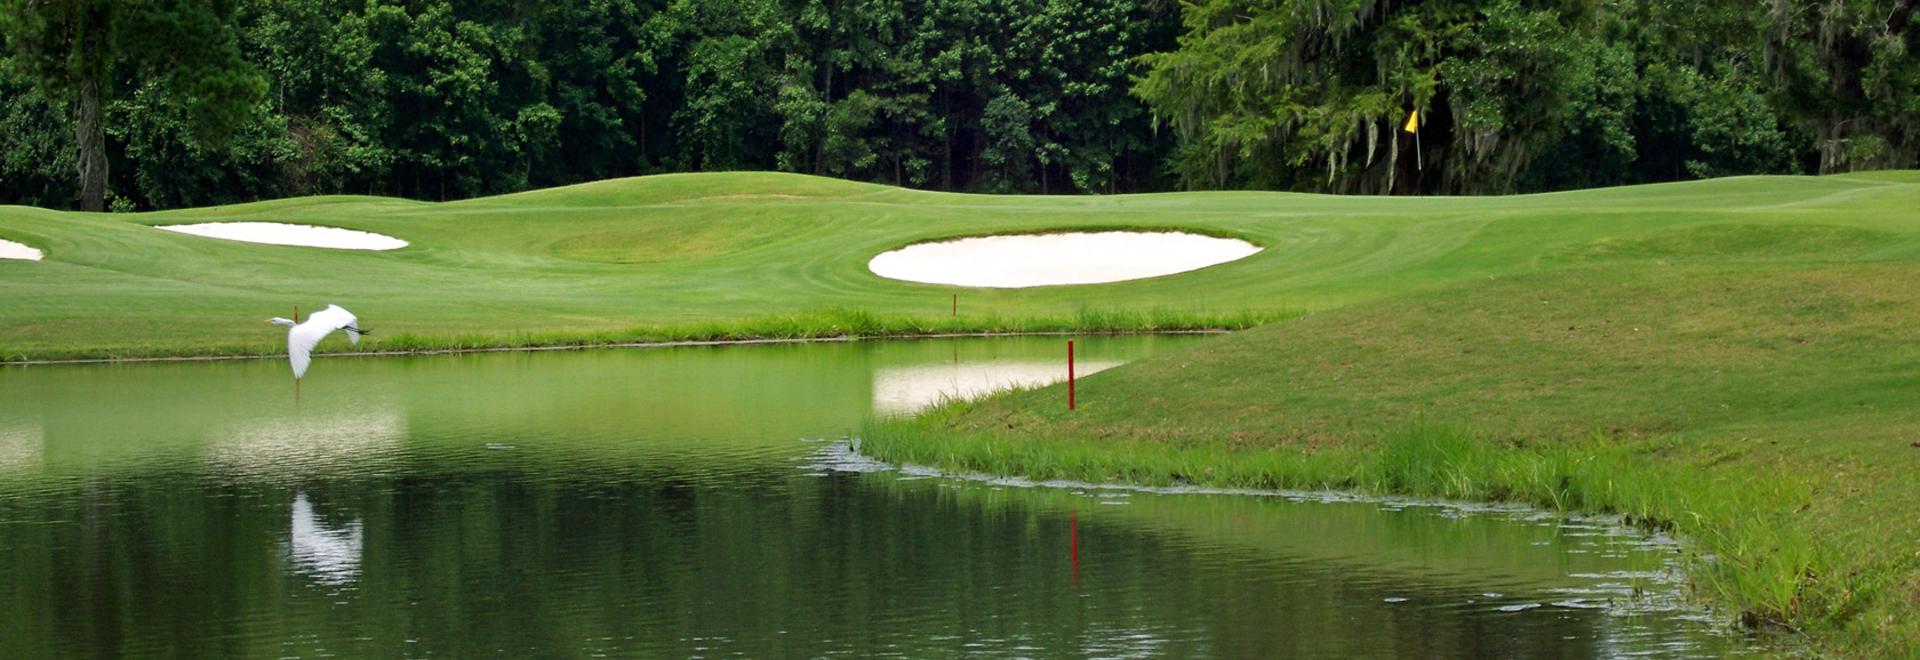 Golf Savannah Ga >> Welcome To Crosswinds Golf Club Crosswinds Golf Club